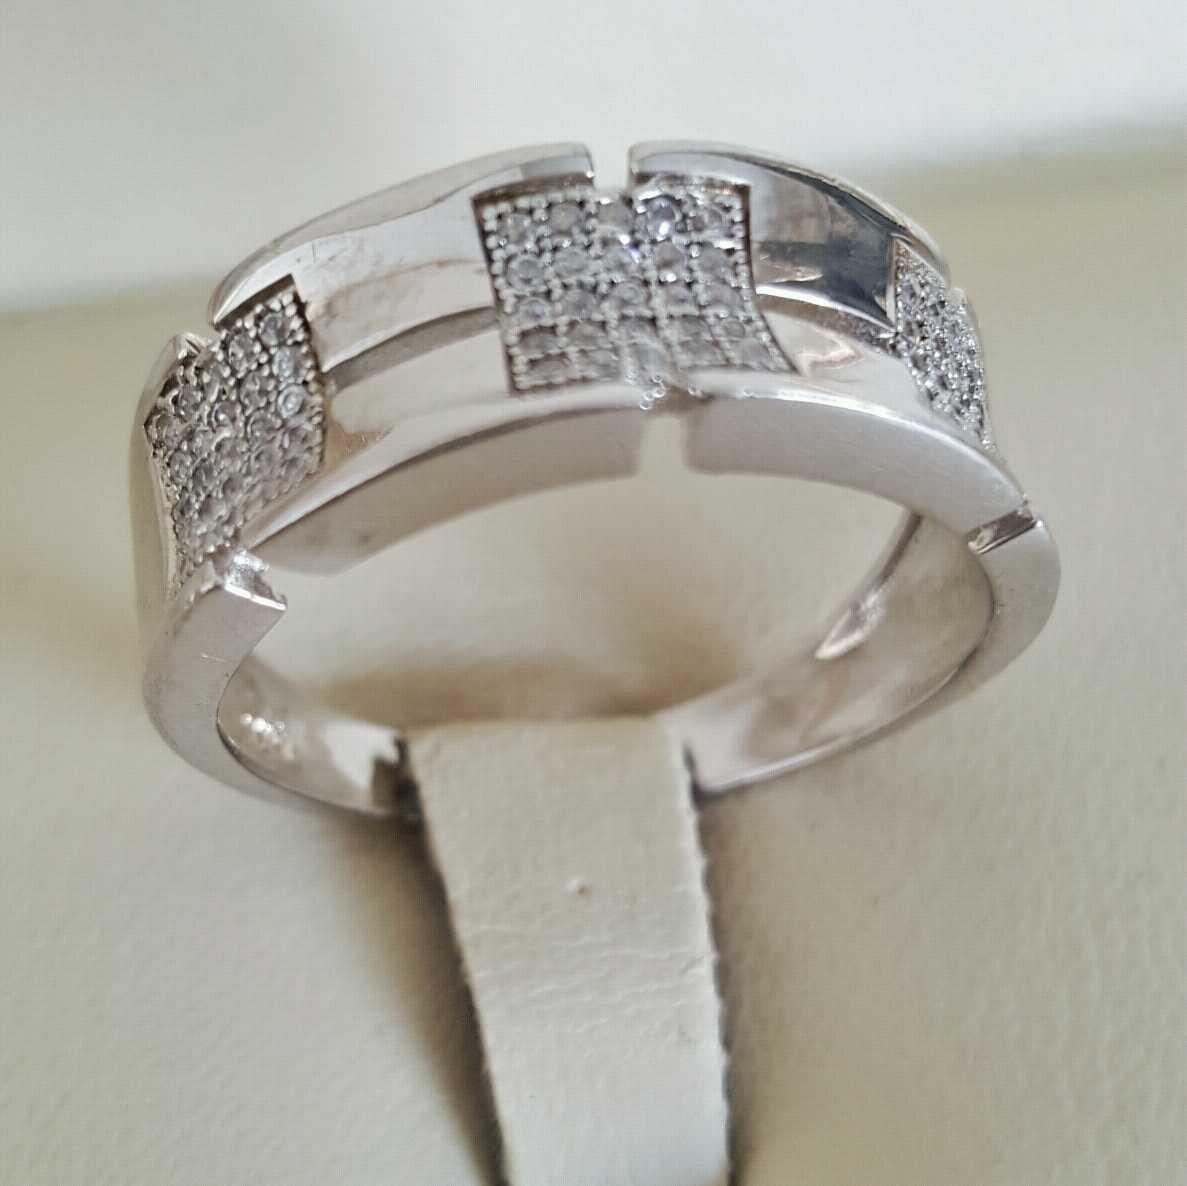 Real Silver 925 Jewellery Buy in Pakistan 81 natural gemstones pakistan + 925 silver jewelry online